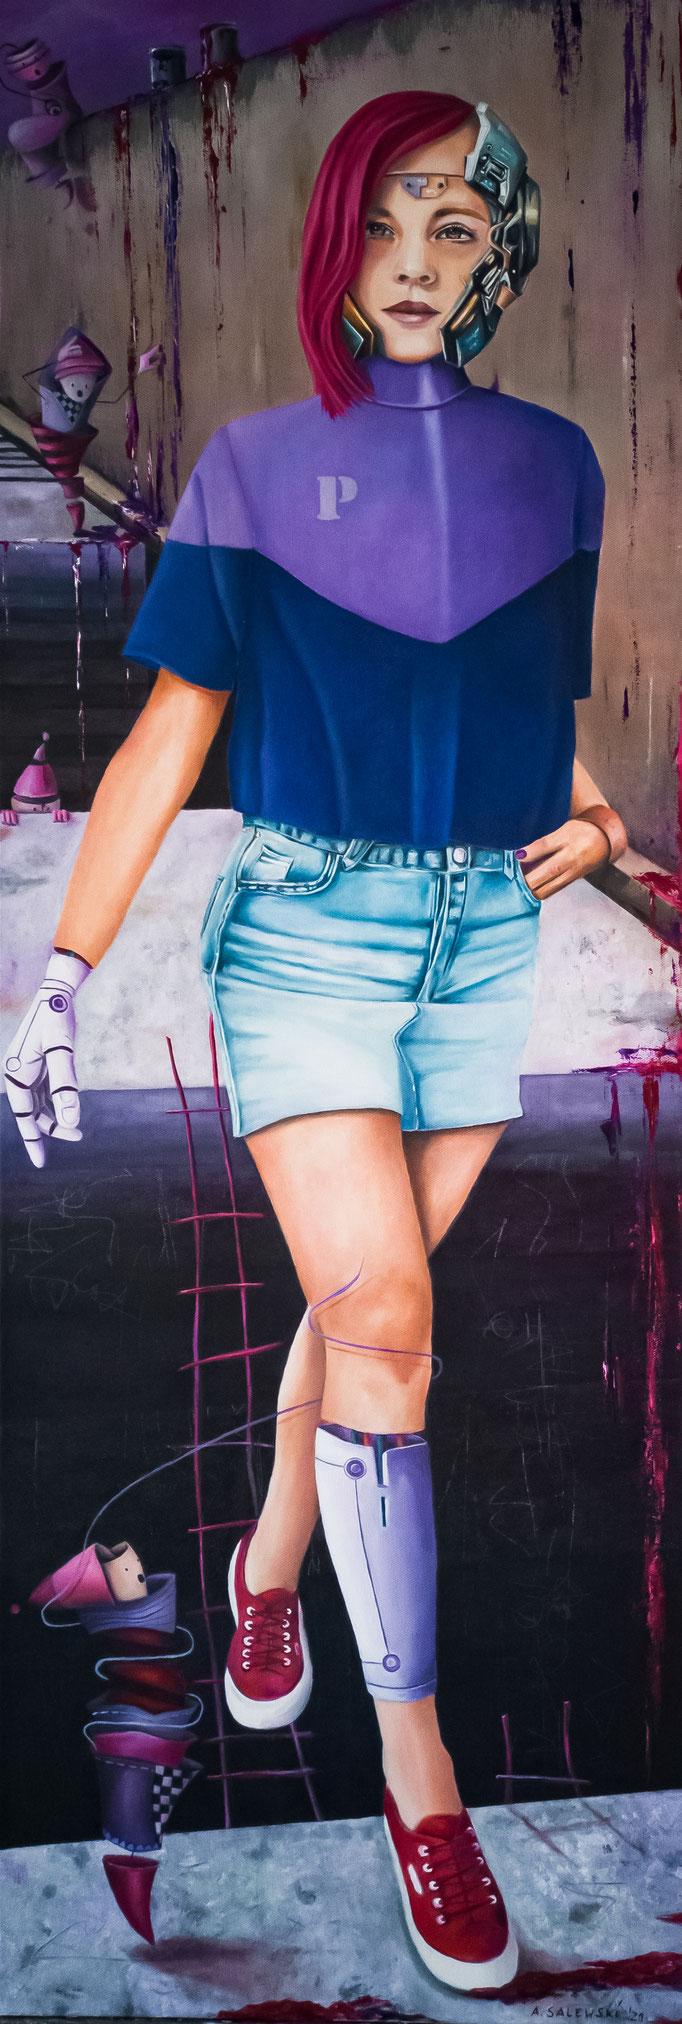 """Purple City""   2021   Öl und Acryl auf Leinwand   40x120 cm"